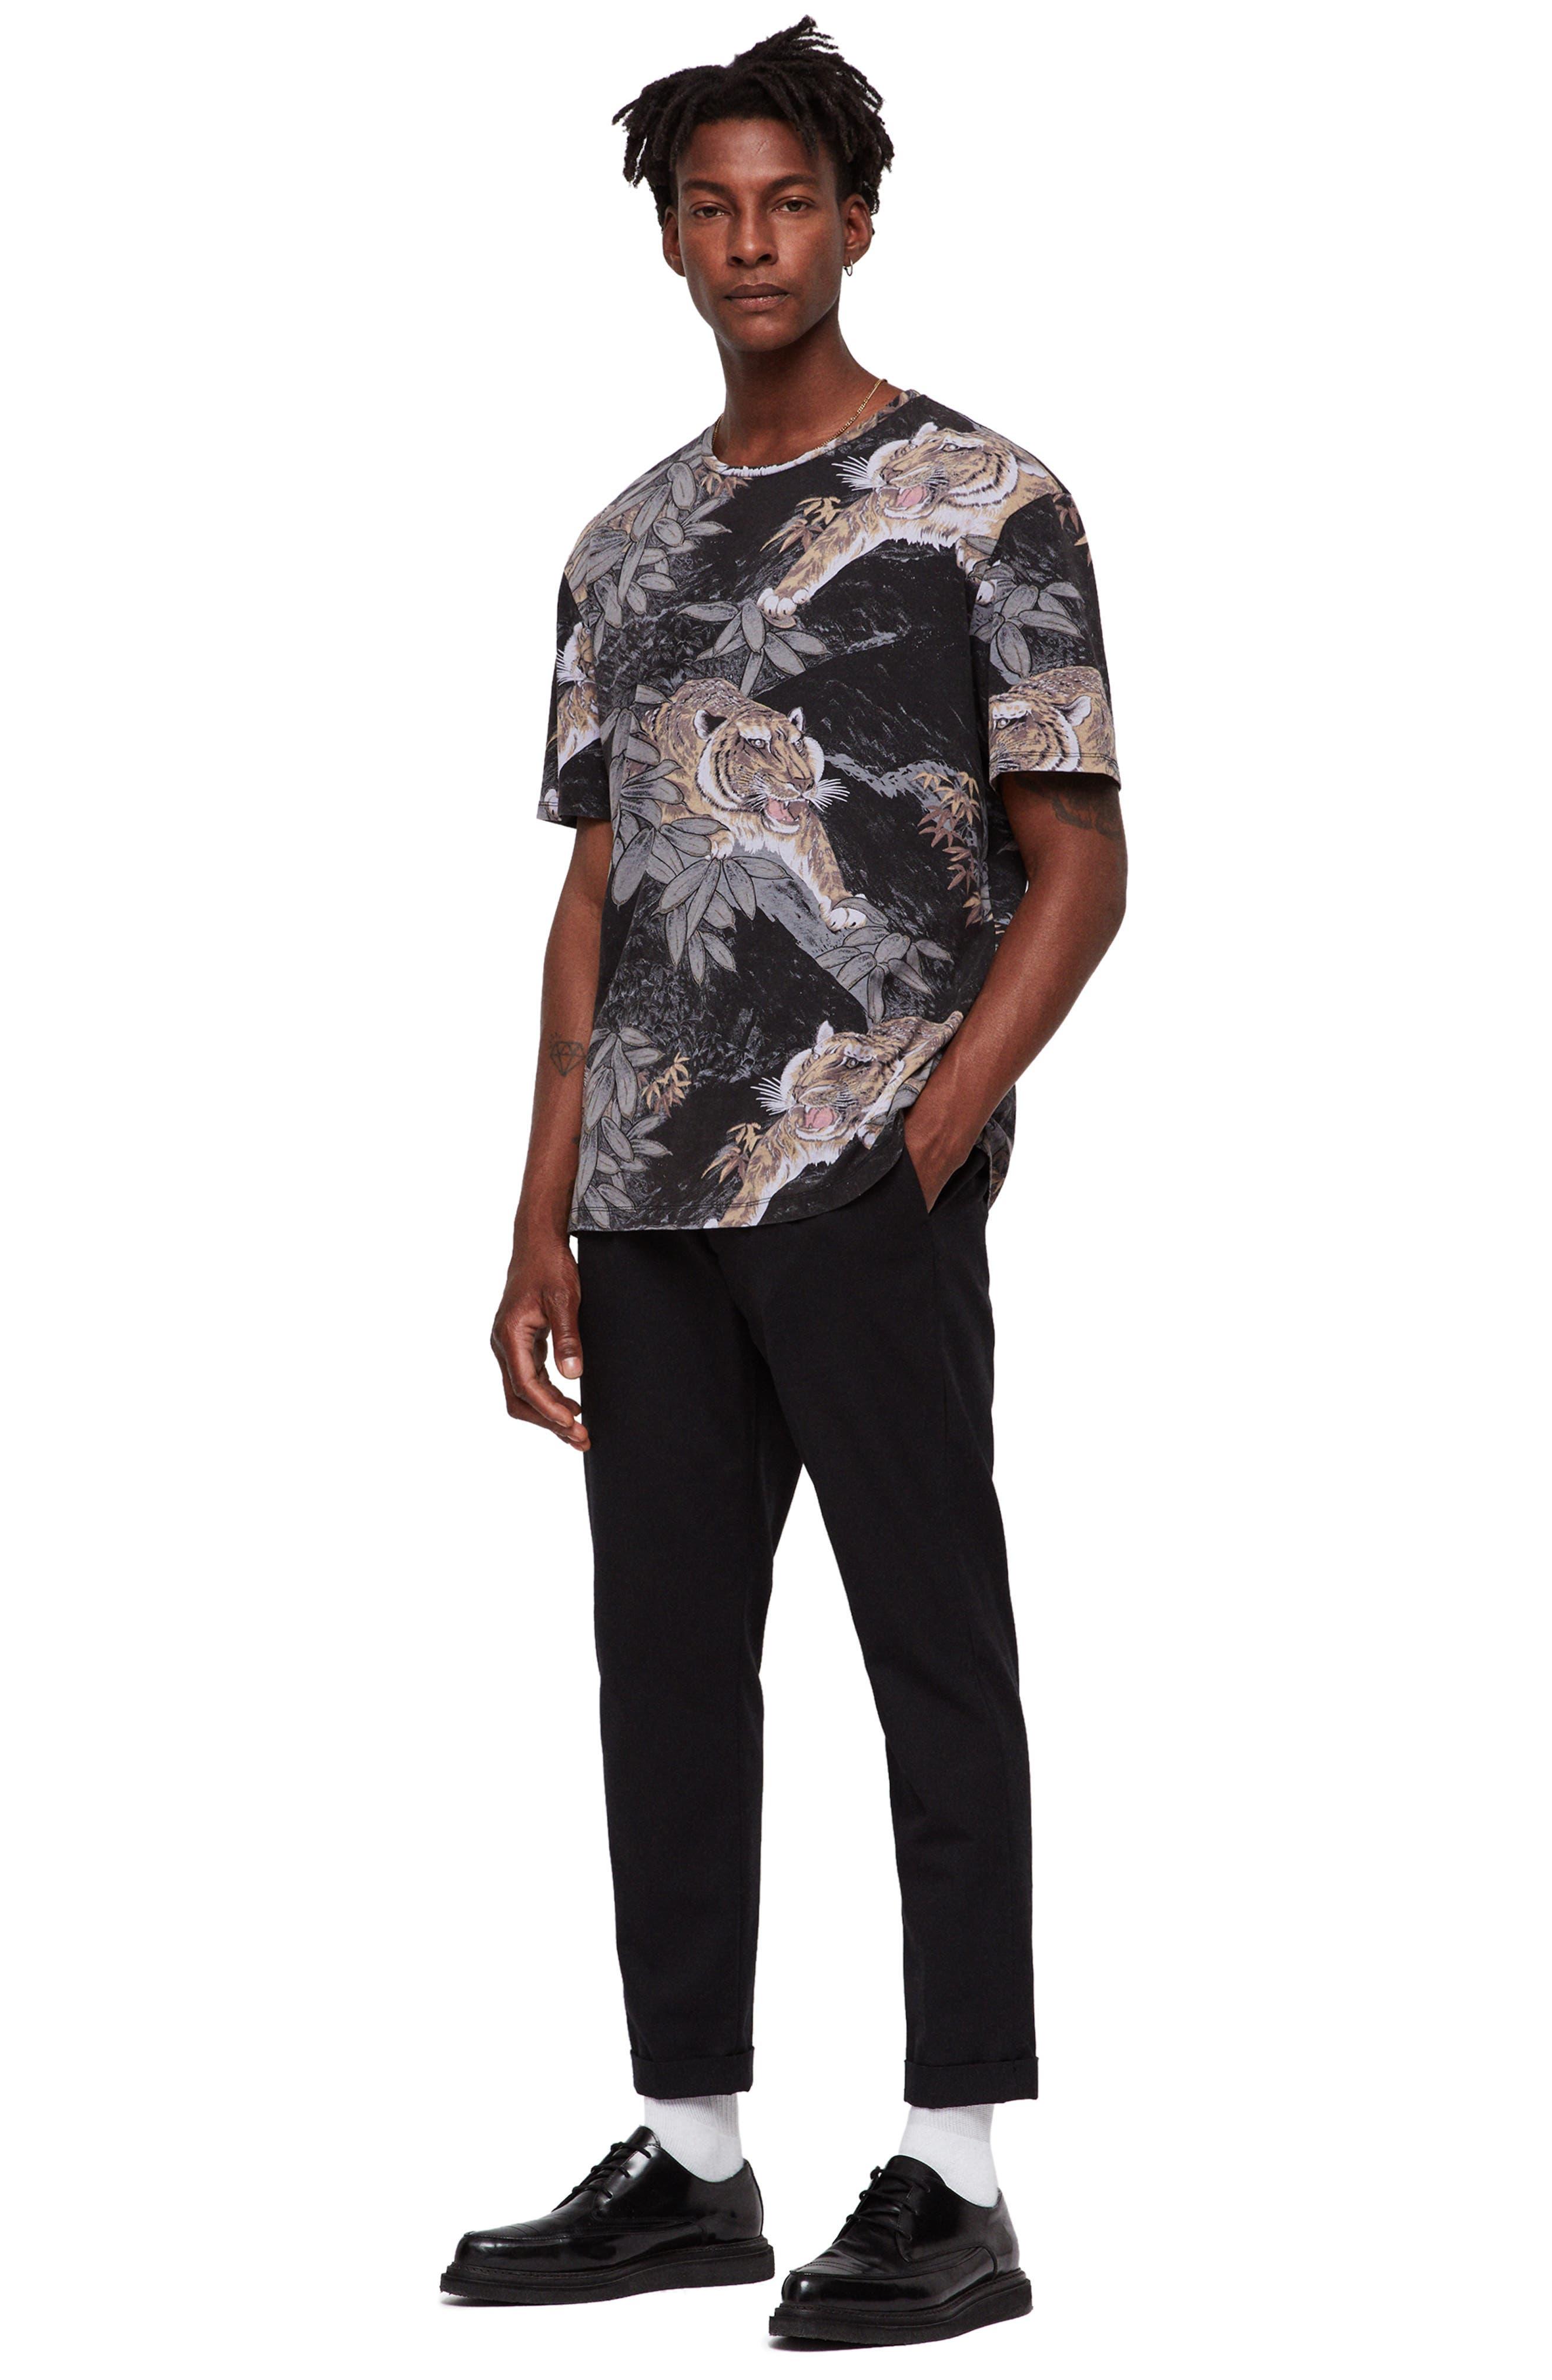 Chokai Slim Fit T-Shirt,                             Alternate thumbnail 7, color,                             VINTAGE BLACK